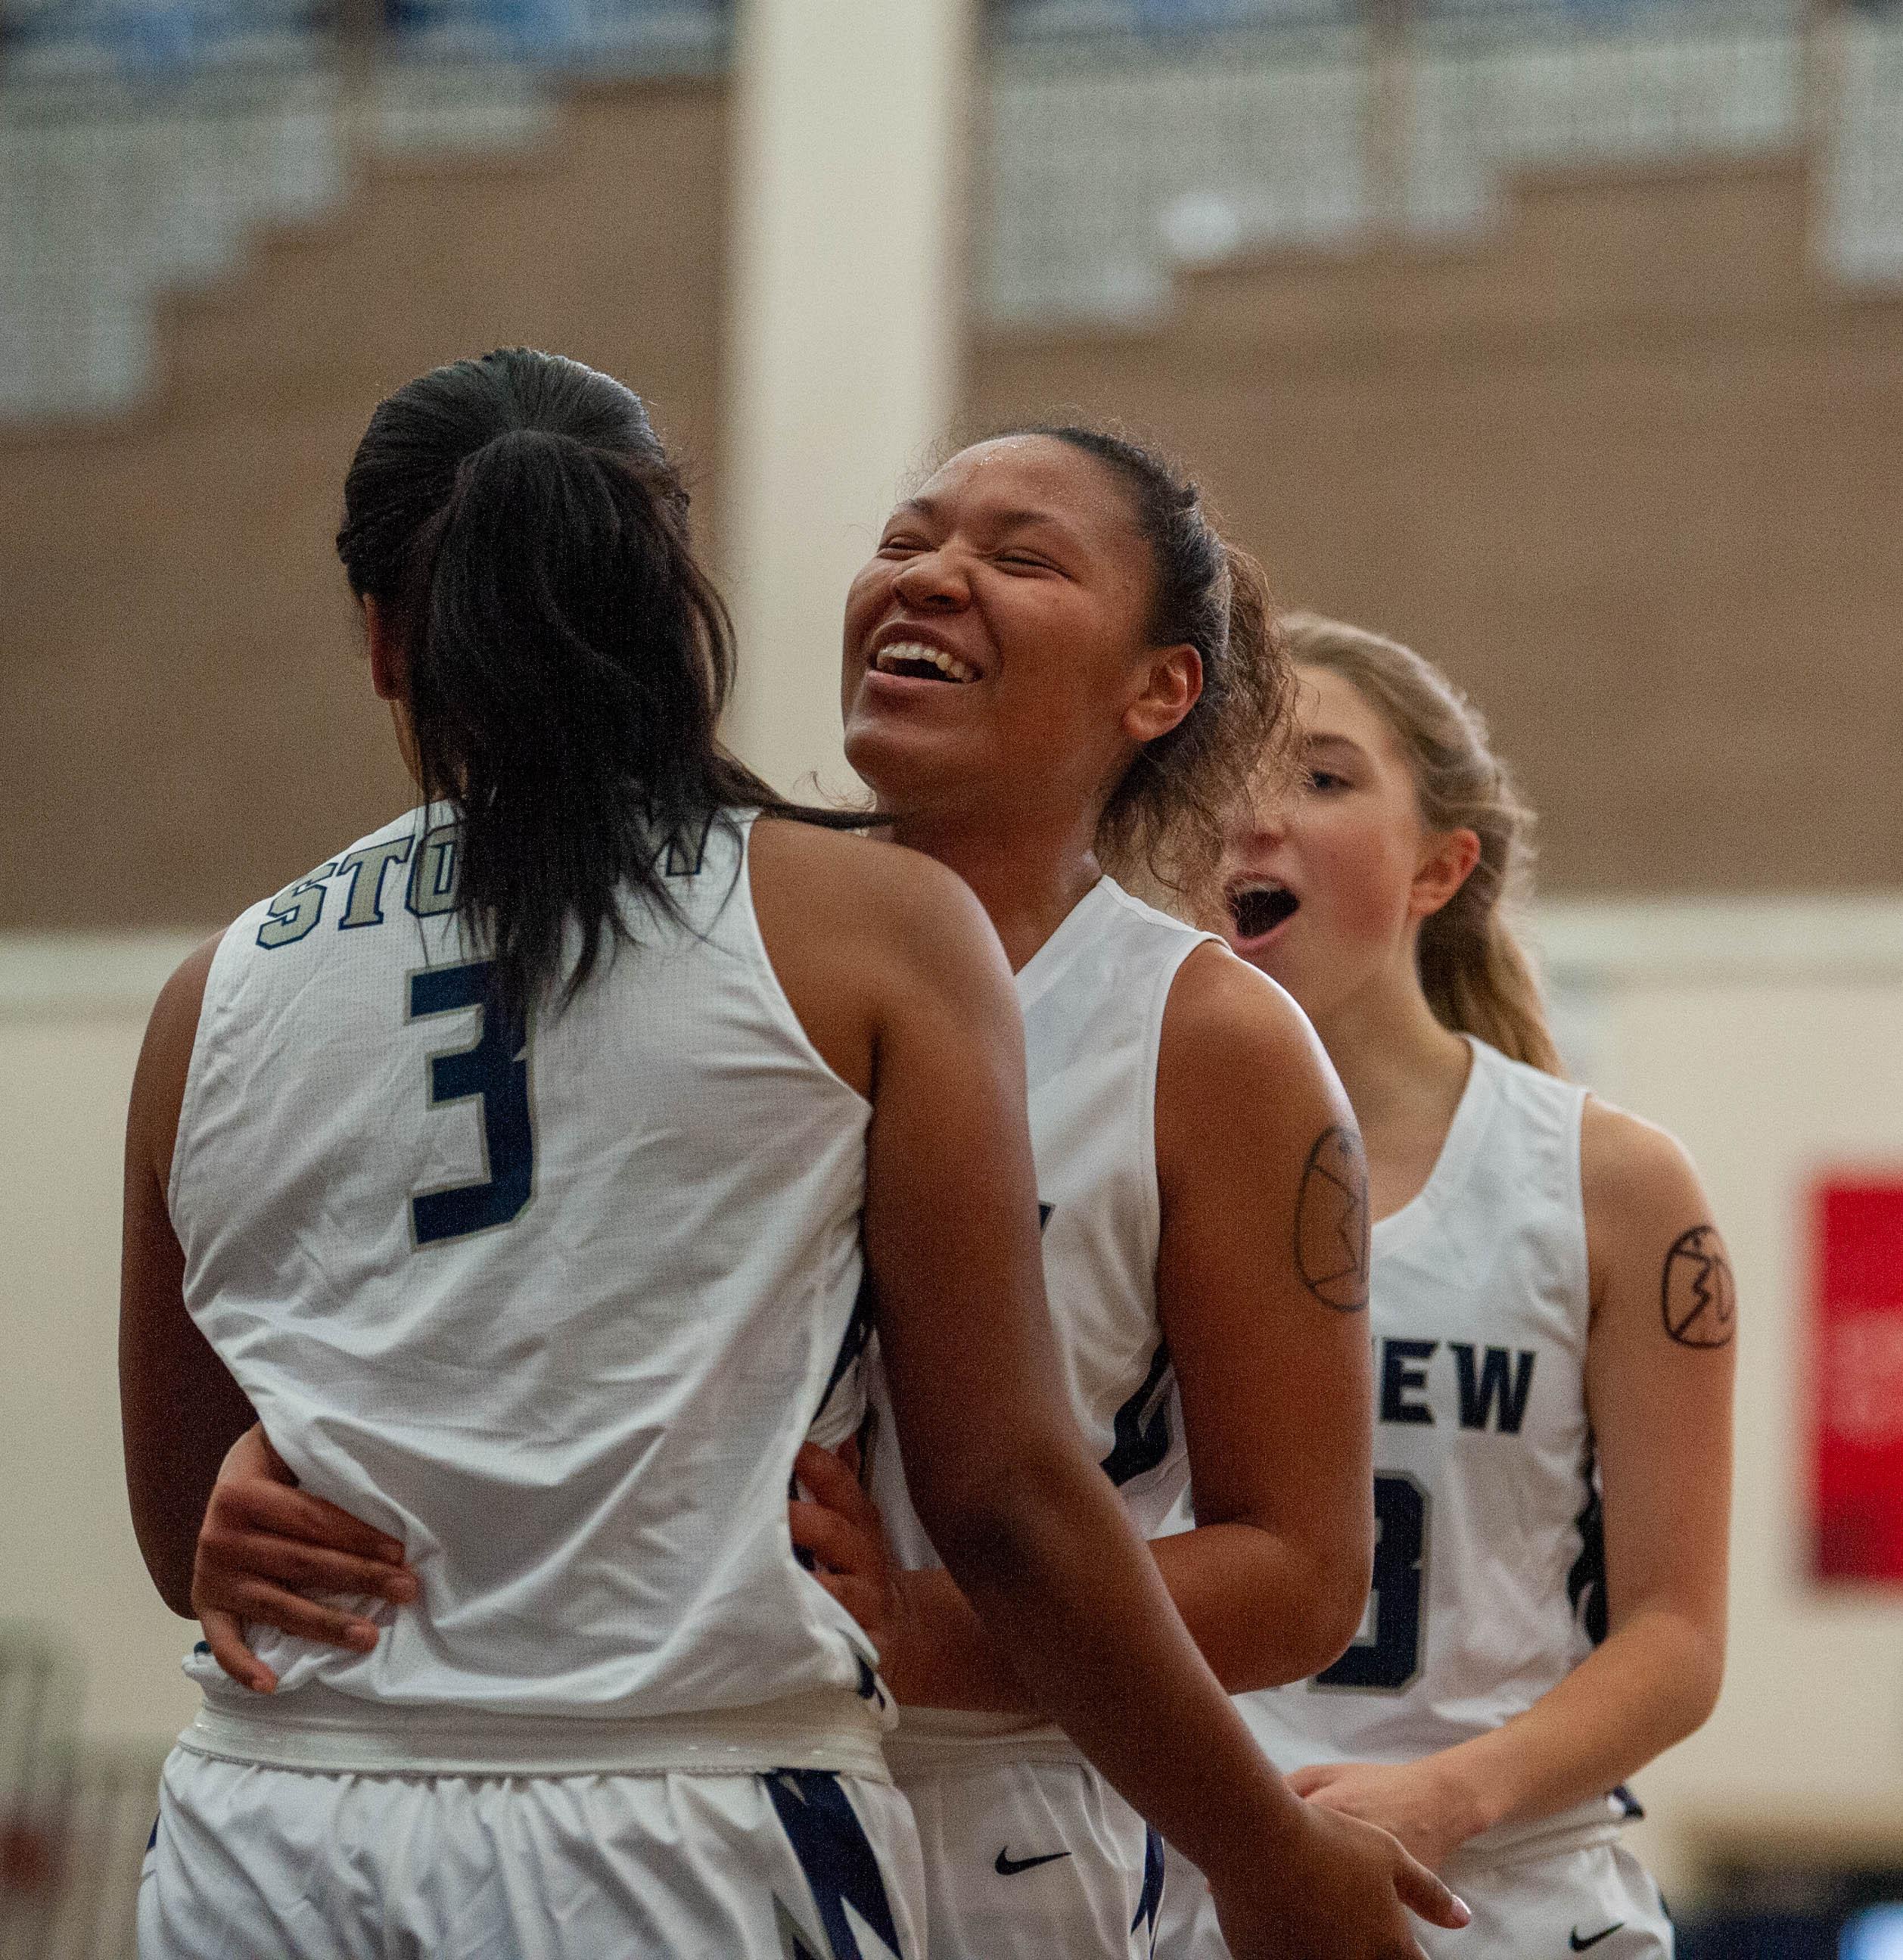 Images from a girls basketball jamboree Saturday morning at Skyview High School. (Joshua Hart/The Columbian)